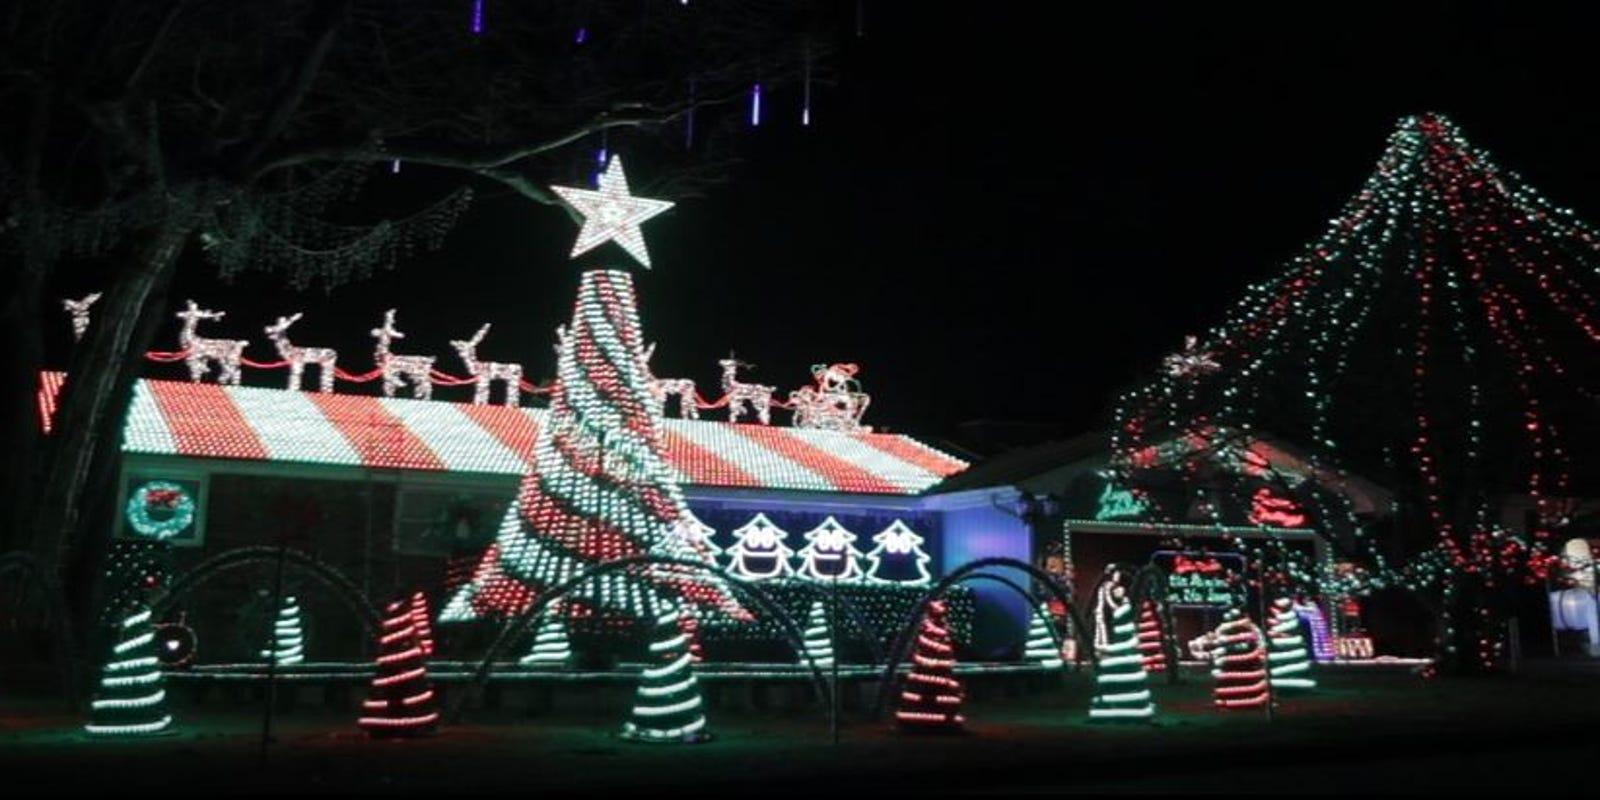 Christmas lights displays in the Ozarks